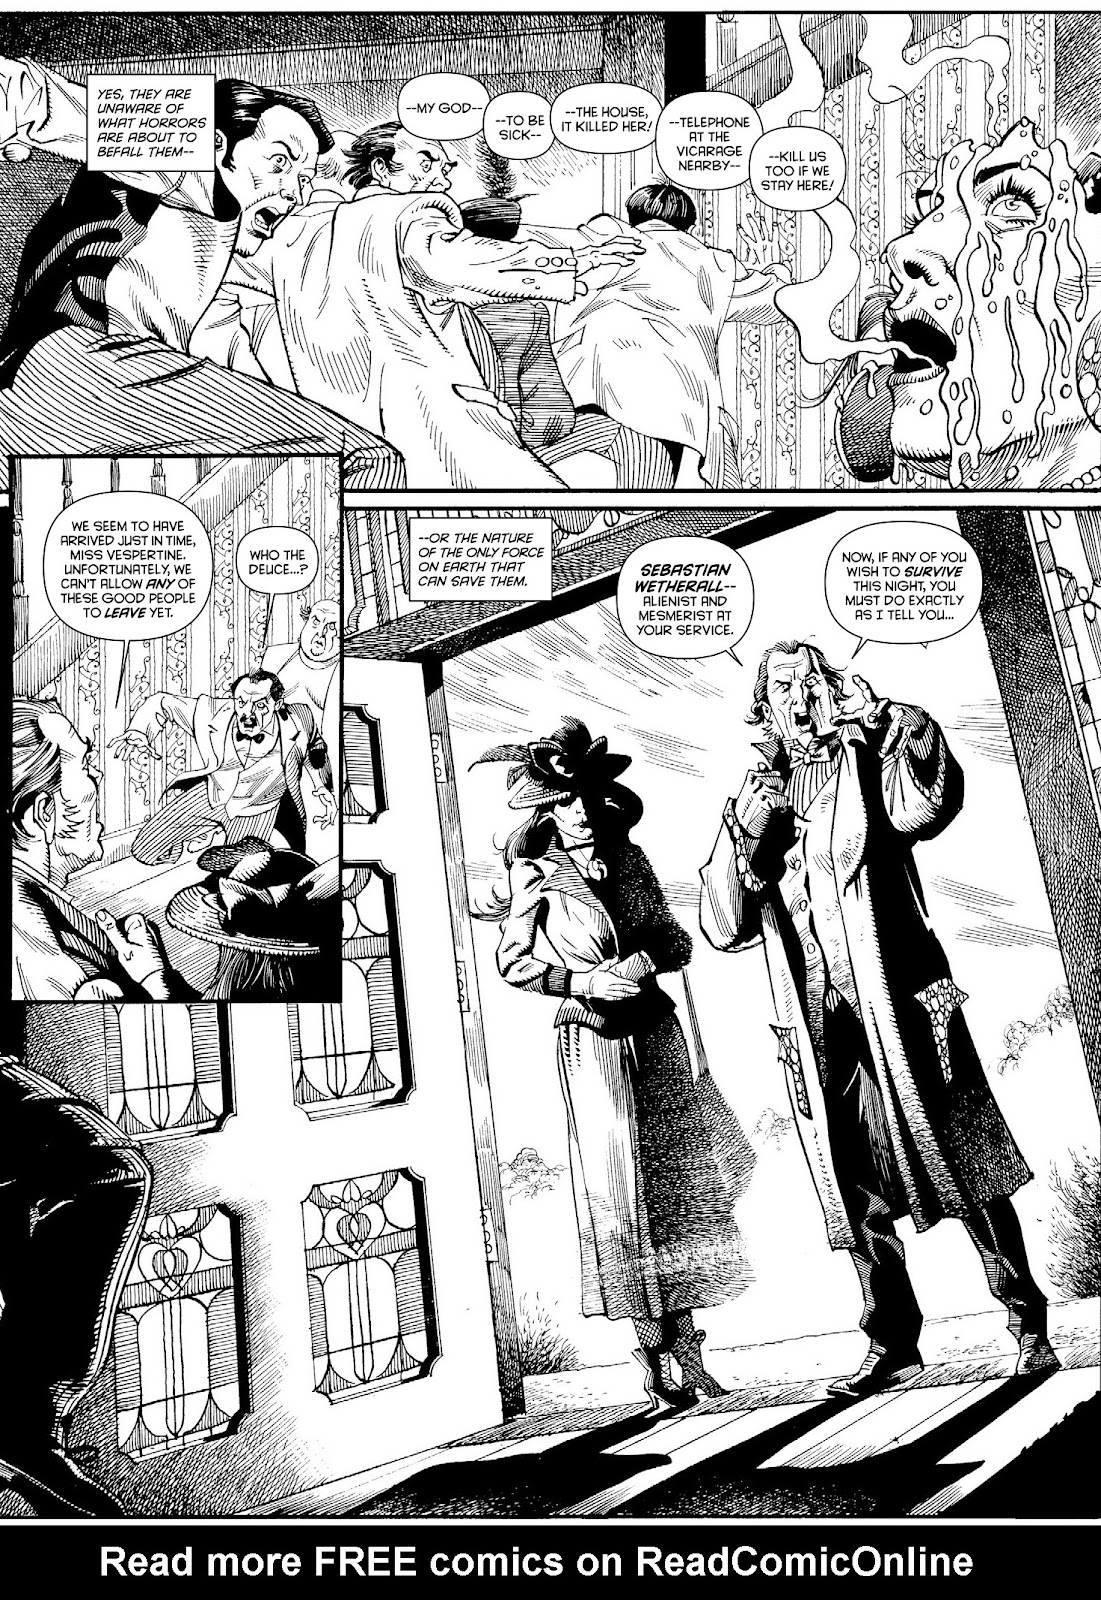 Judge Dredd Megazine (Vol. 5) issue 427 - Page 83